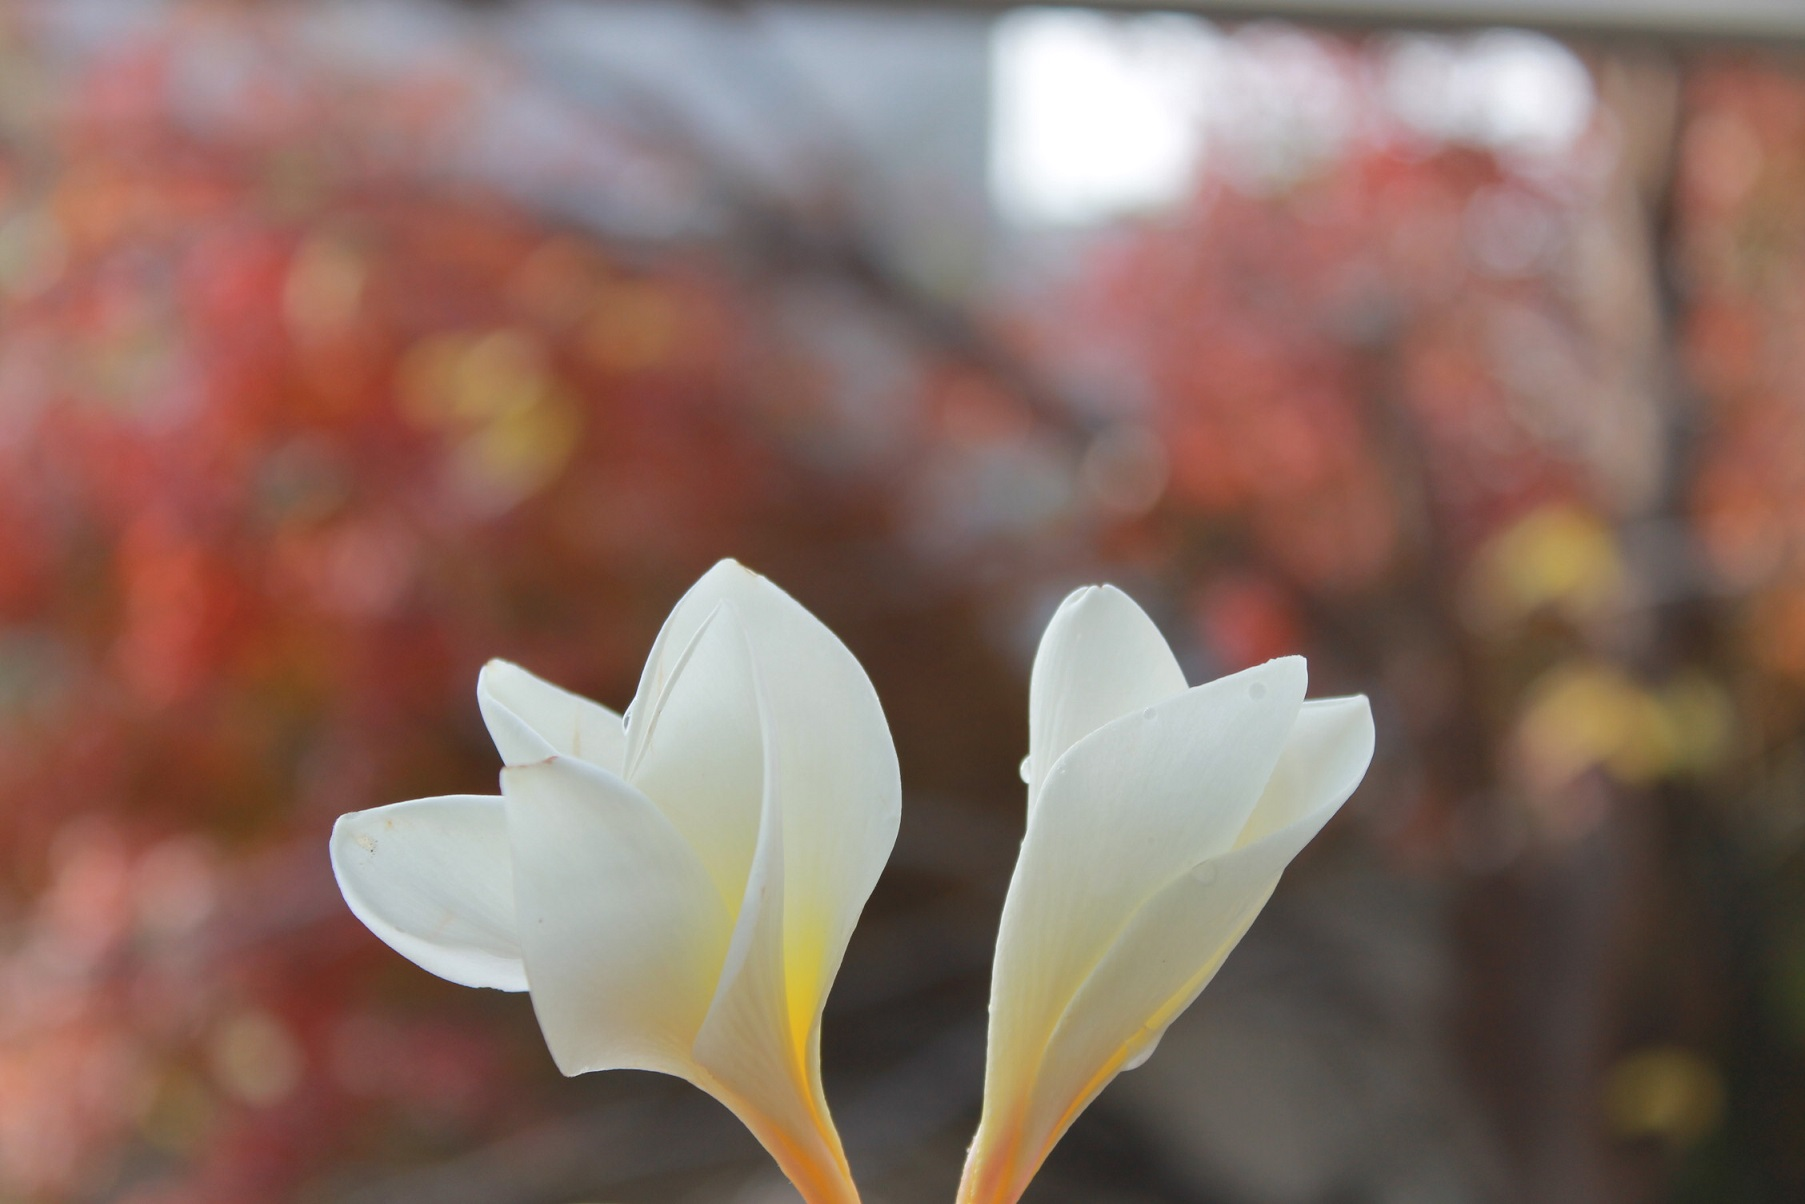 蘭香茶館の季節、_f0070743_10533811.jpg